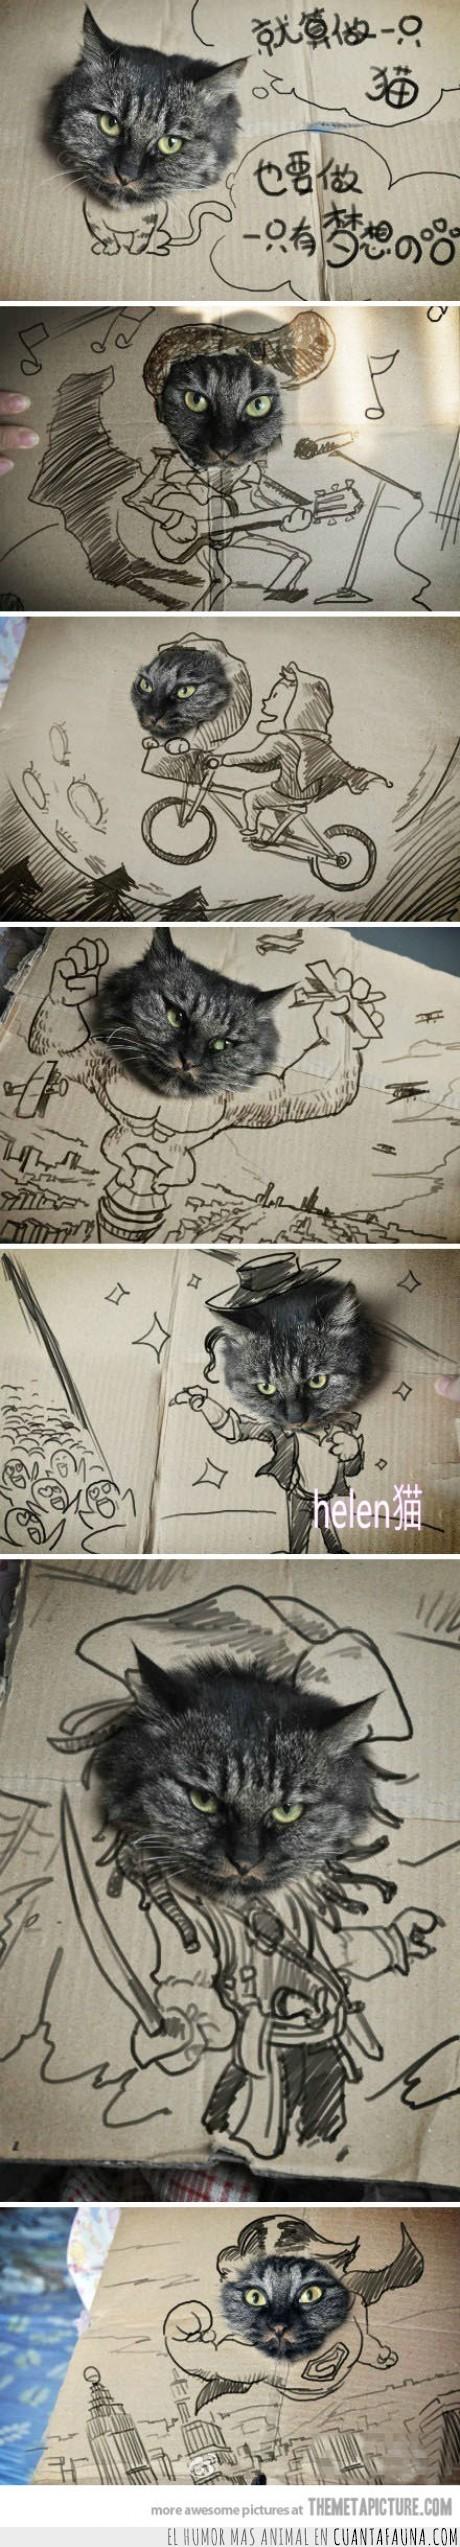 cara,carton,dibujar,dibujo,gato,heroe,meter,profesiones,volar